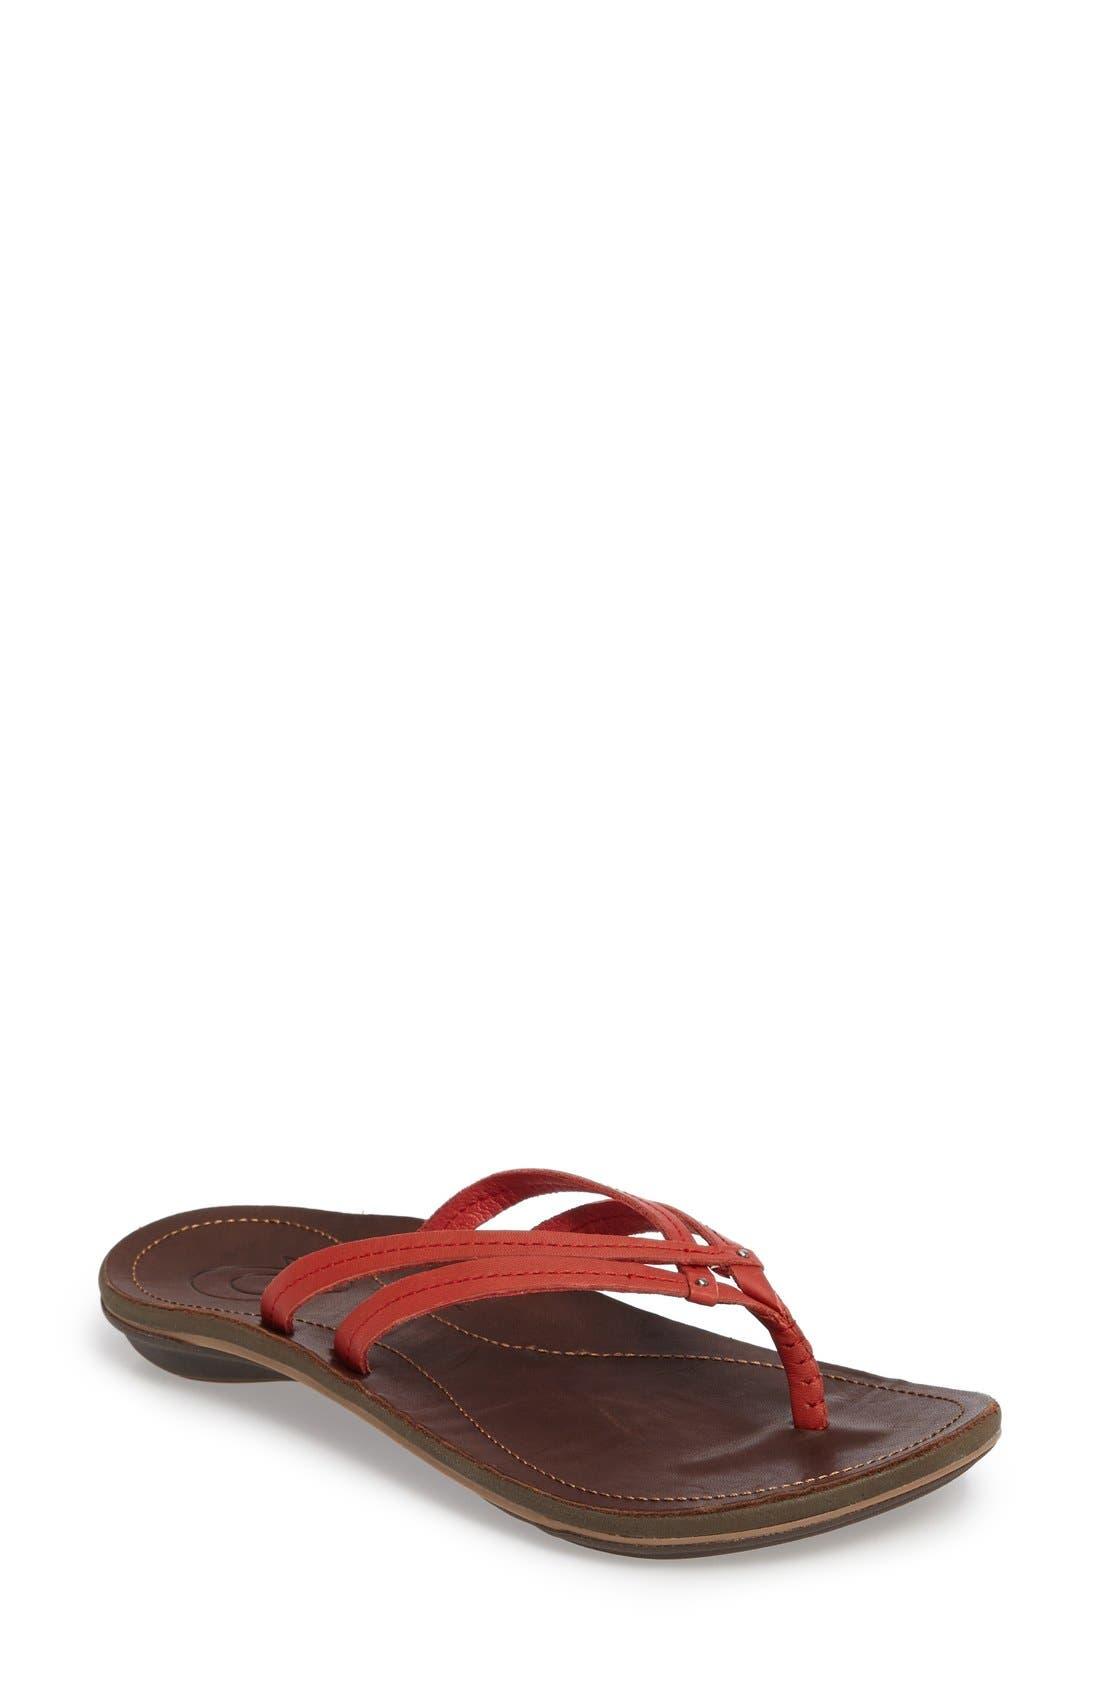 Alternate Image 1 Selected - OluKai 'U'i' Thong Sandal (Women)